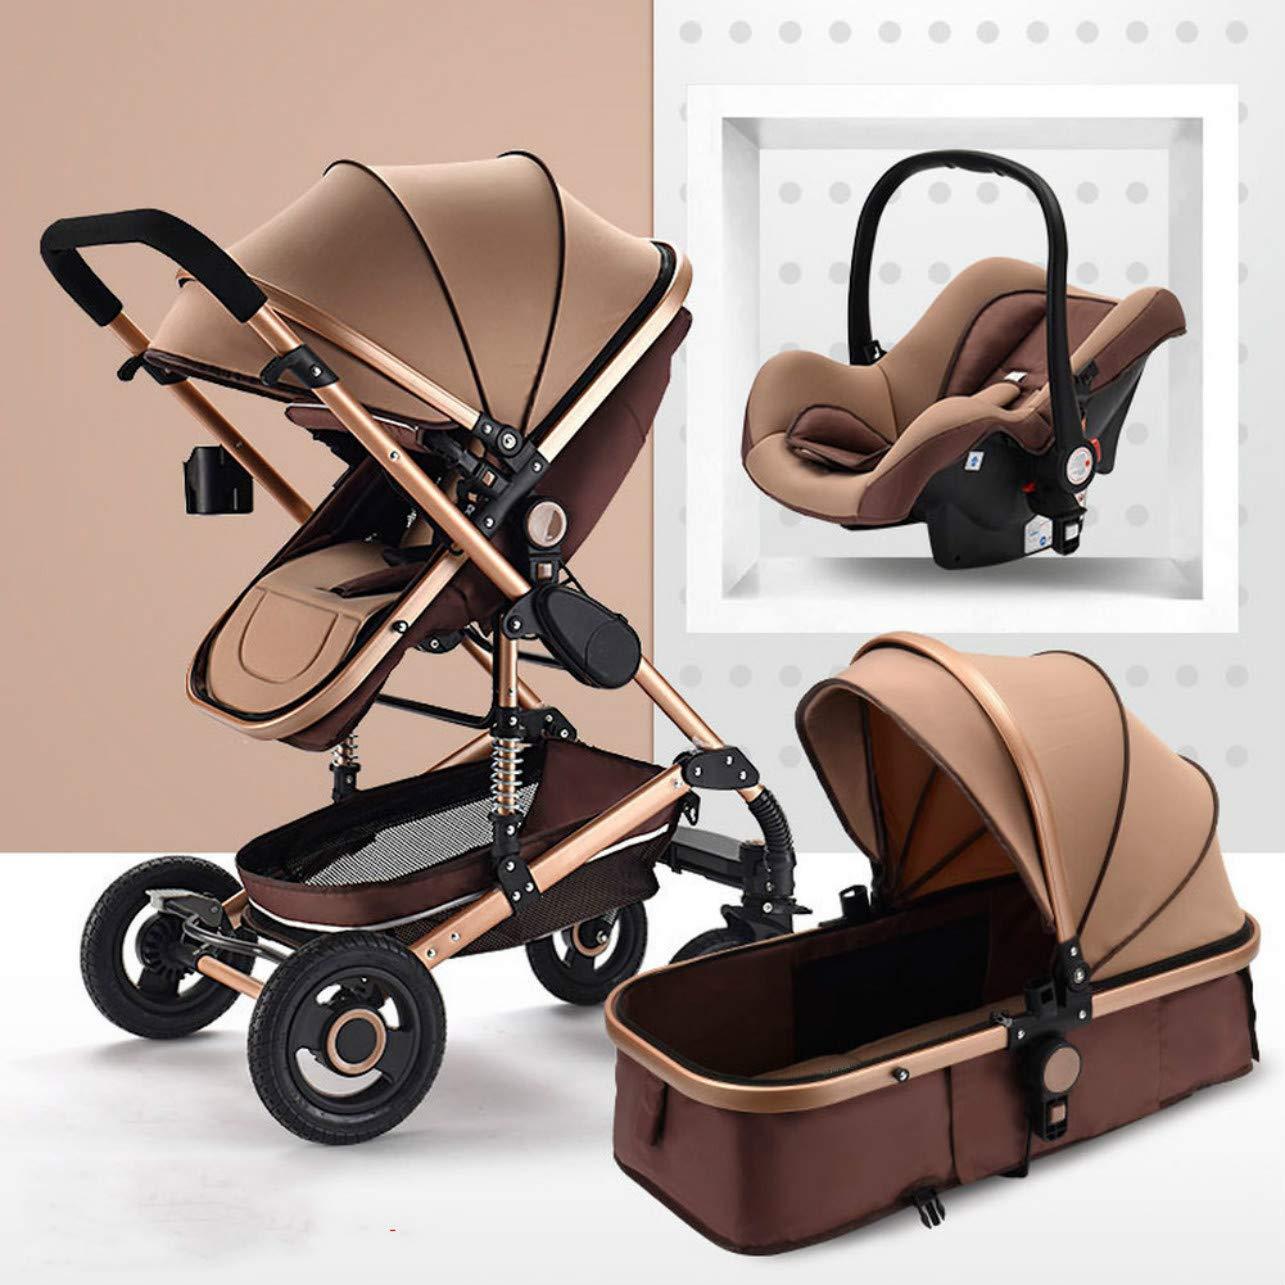 Infant 3 in 1 Foldable Luxury Baby Stroller Travel System,Sleek&Versatile,Easy to Folding,Anti-Shock Springs,Oversized Storage (Khaki 3 in 1) by bleehood